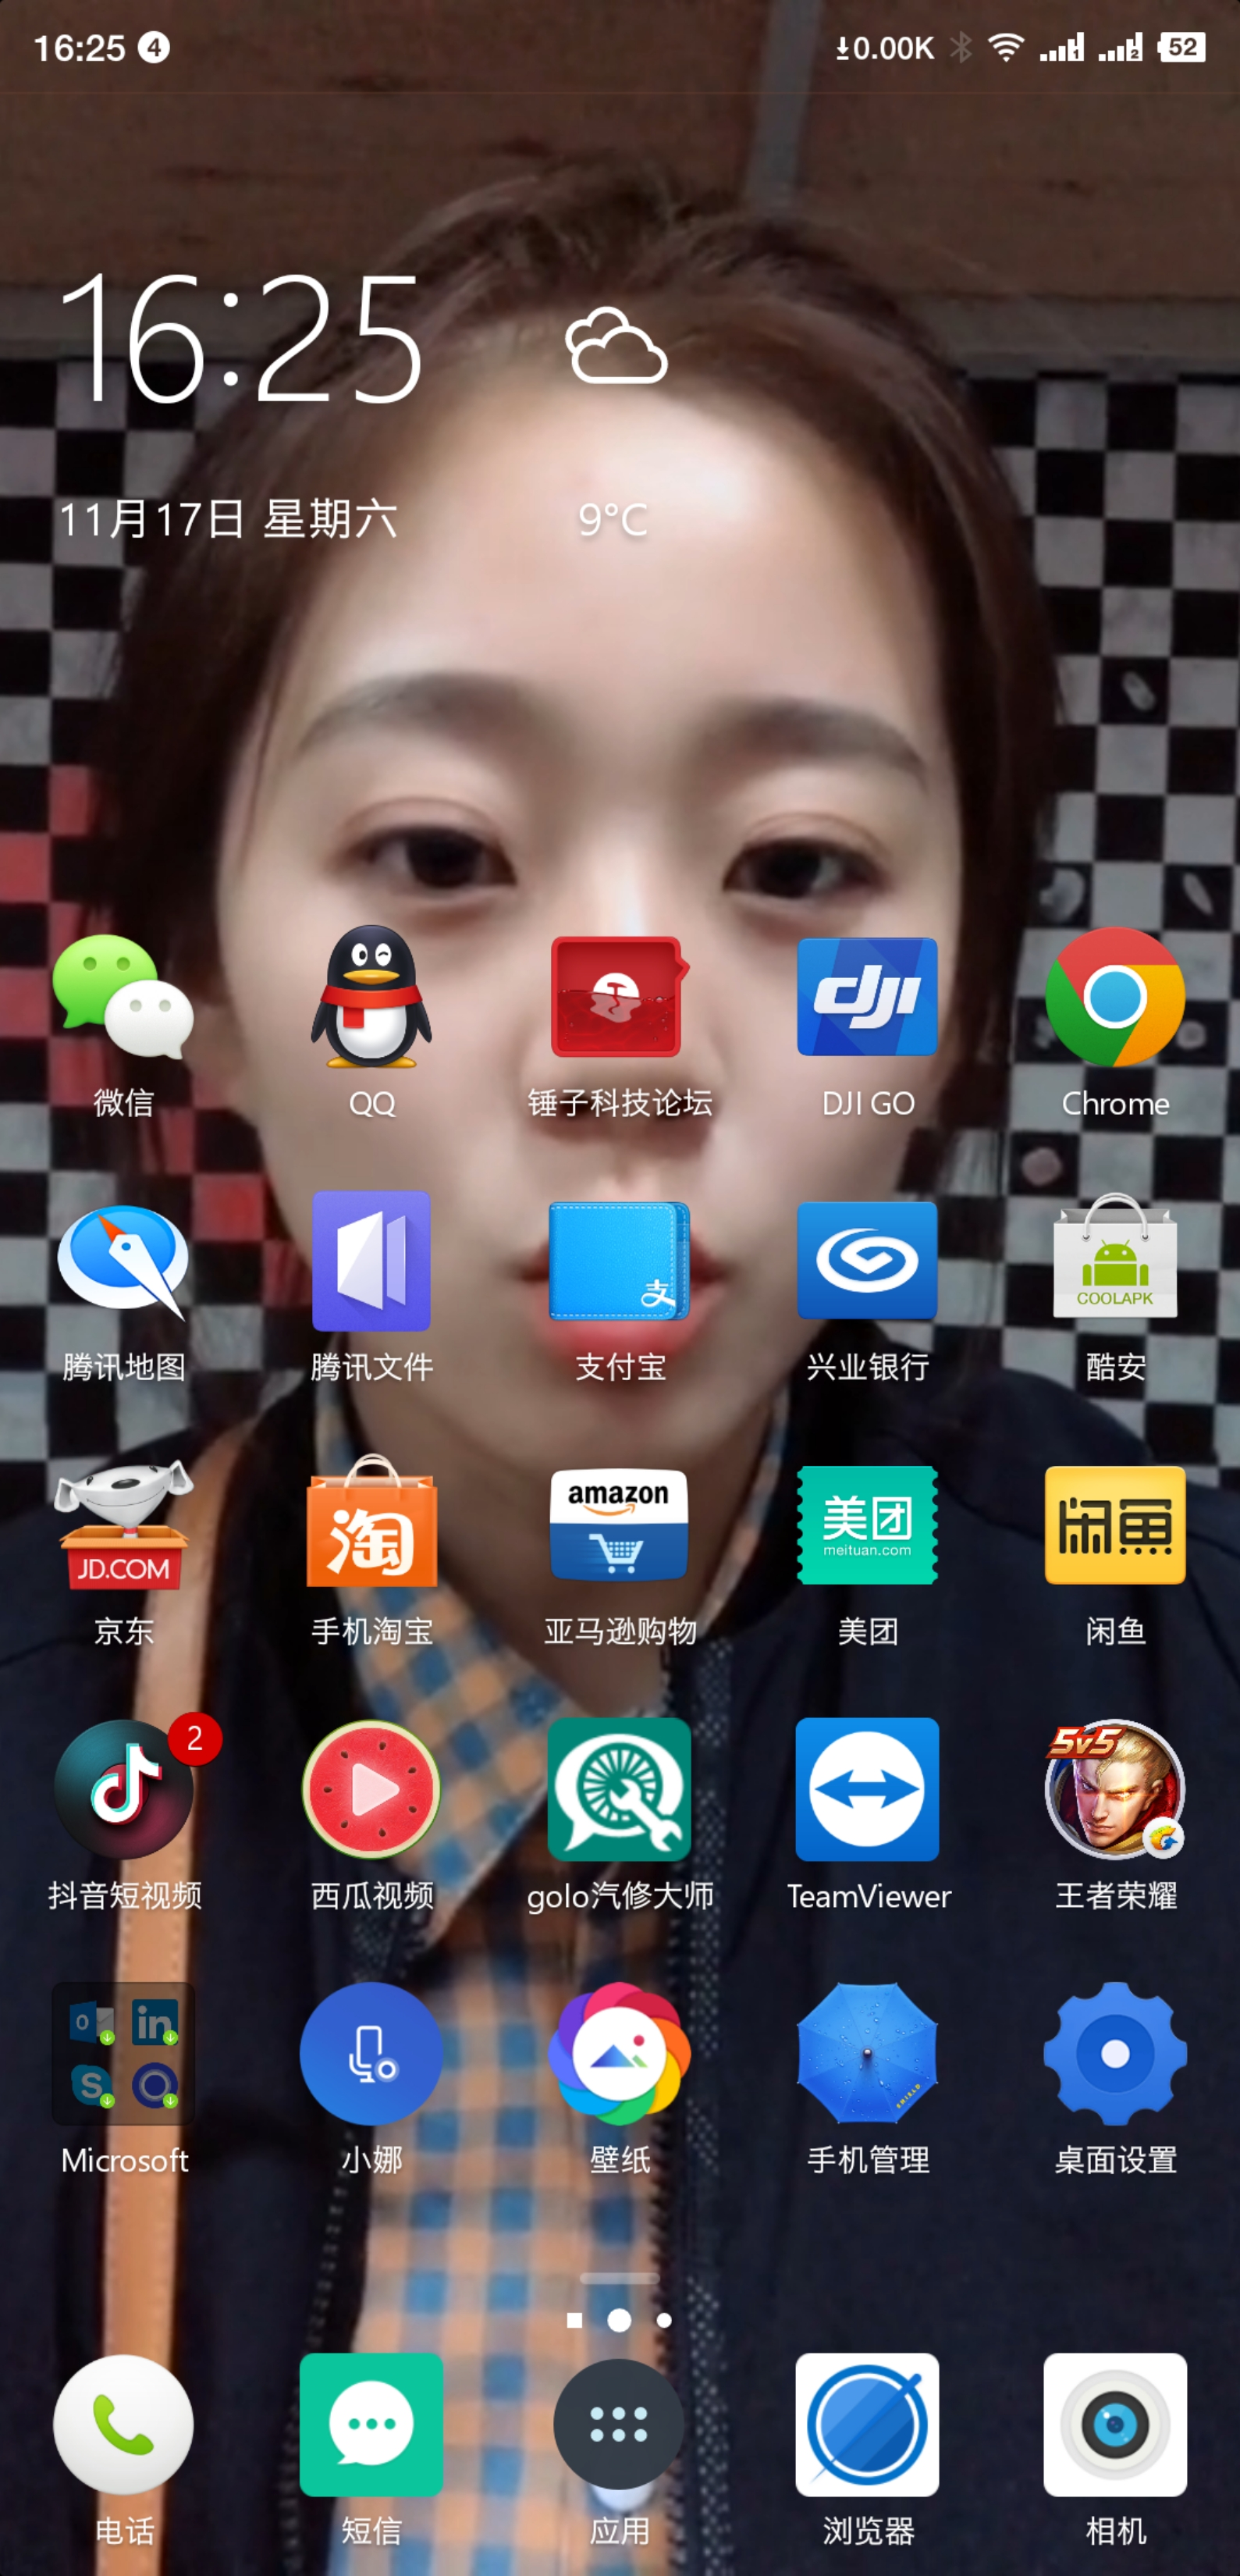 Screenshot_2018-11-17-16-25-42-502.png